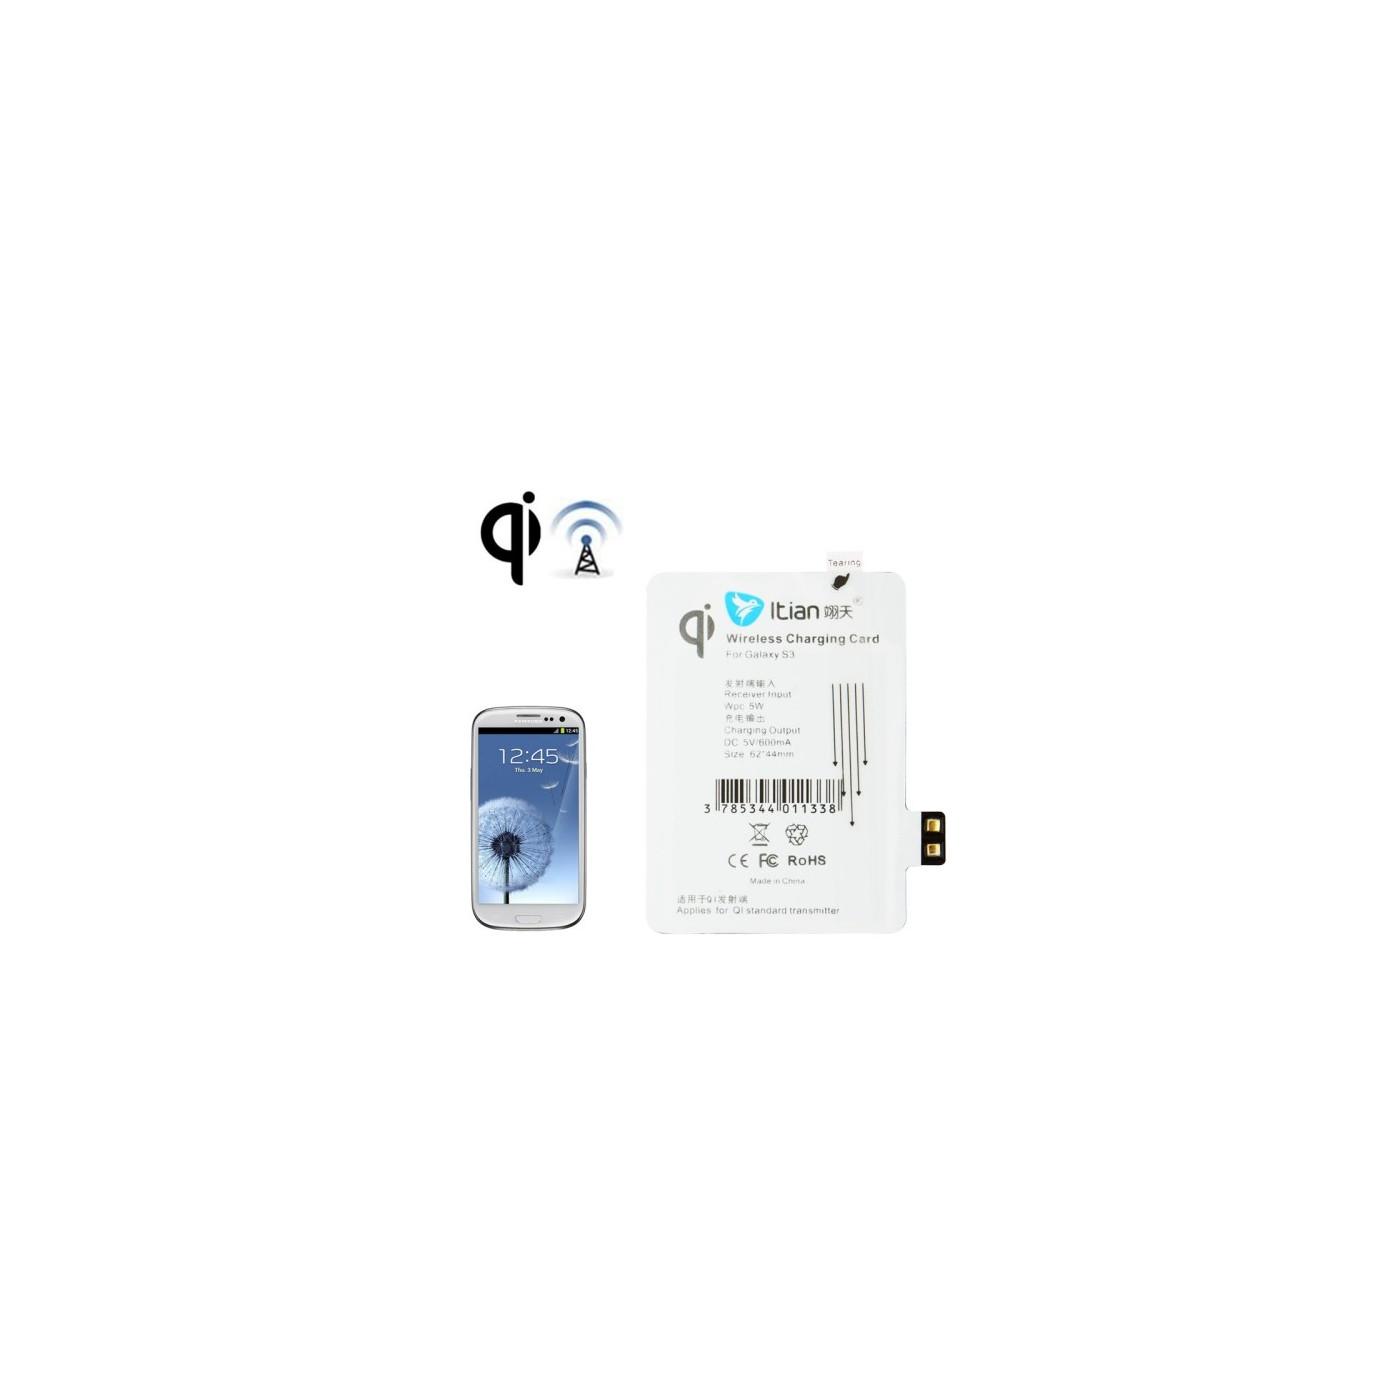 Ricevitore carica wireless per Samsung Galaxy S3 i9300 standard Qi